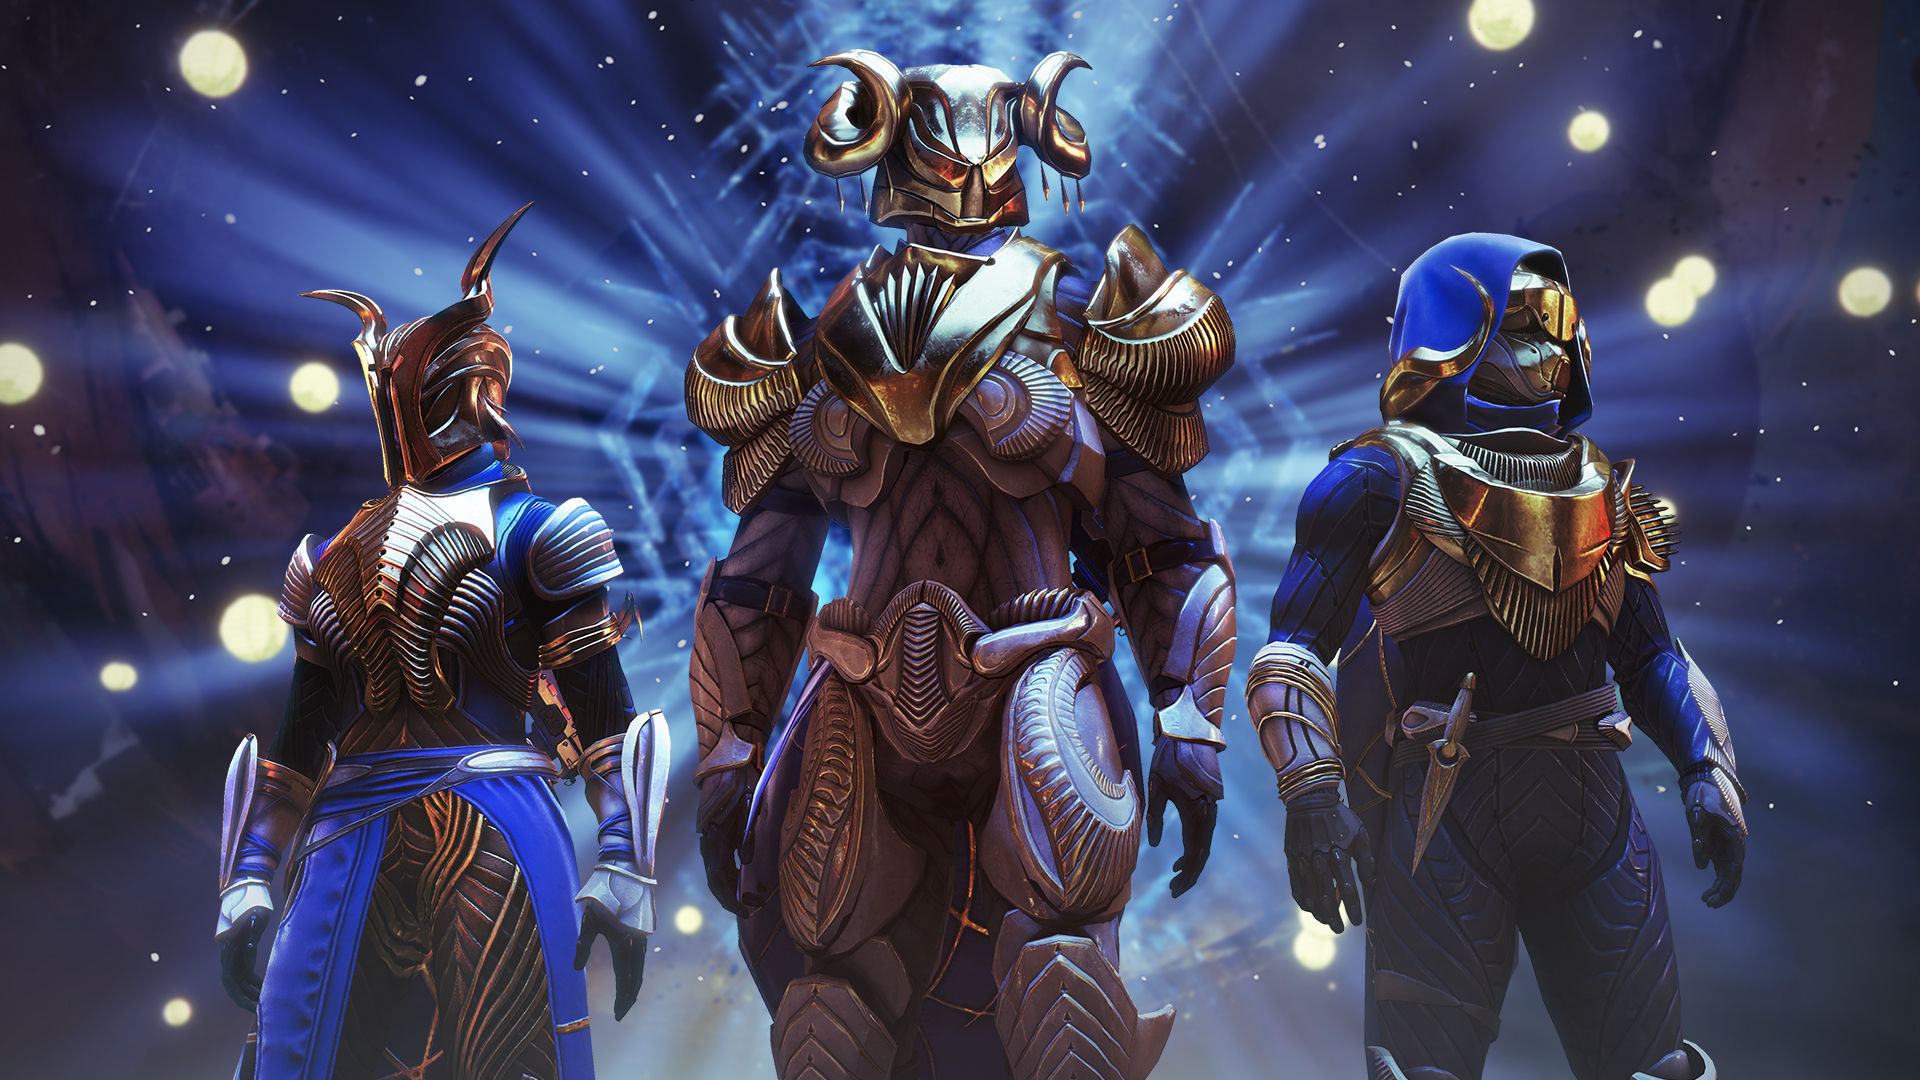 The Dawning Destiny 2 Wallpaper, HD